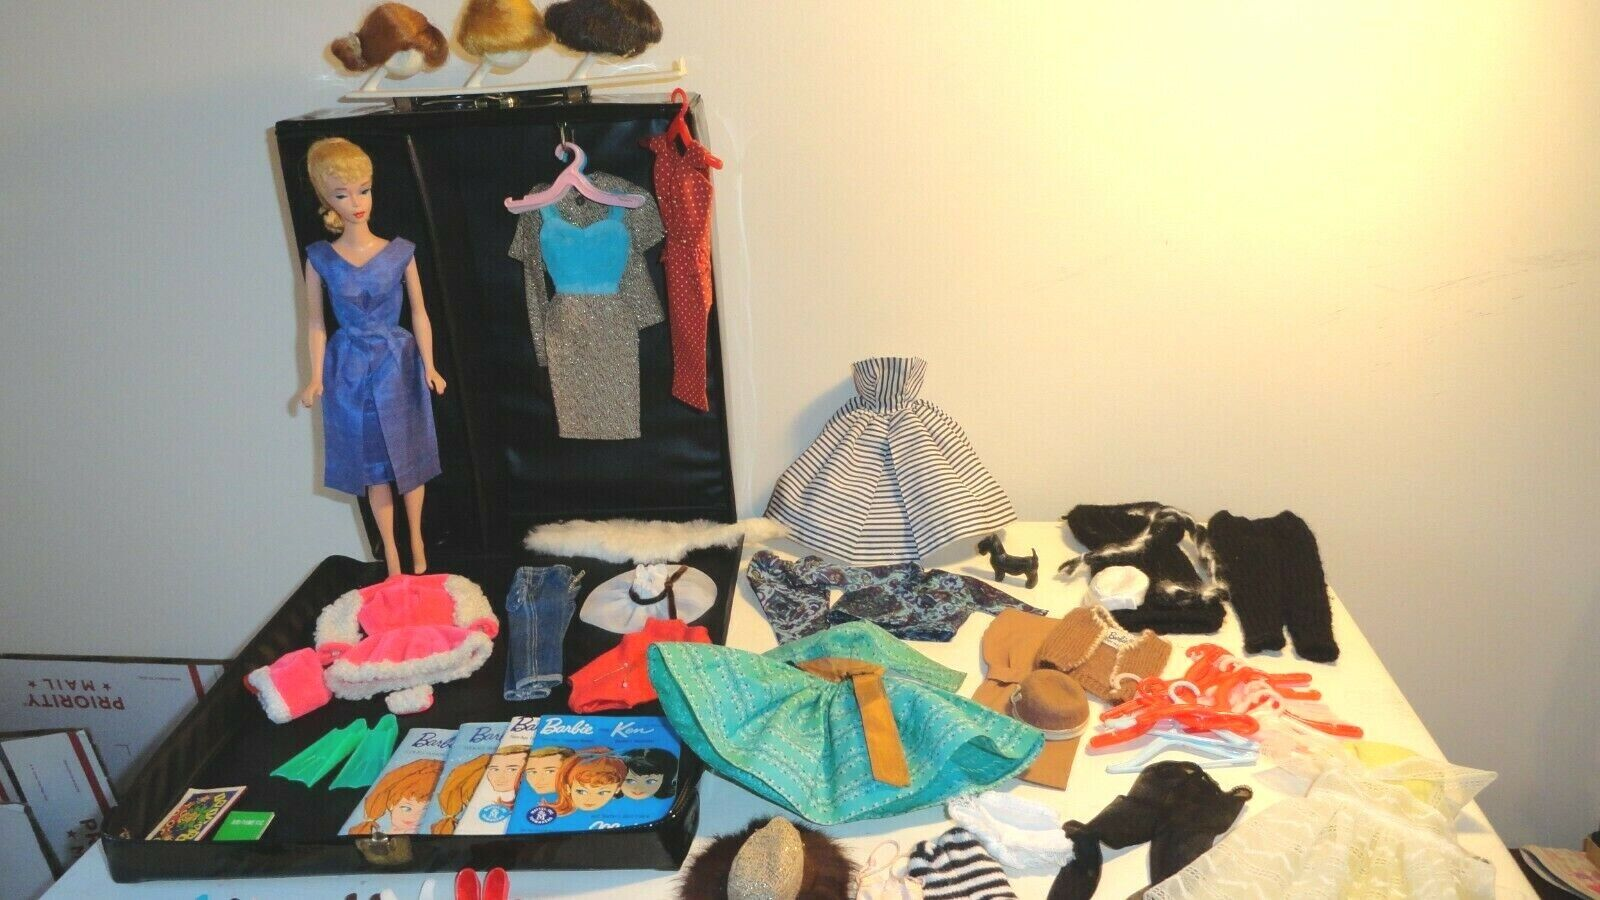 Vintage BARBIE 4 Case LOT, Clothes, Shoes, Accessories Some TLC Clean Early 60s - $341.99